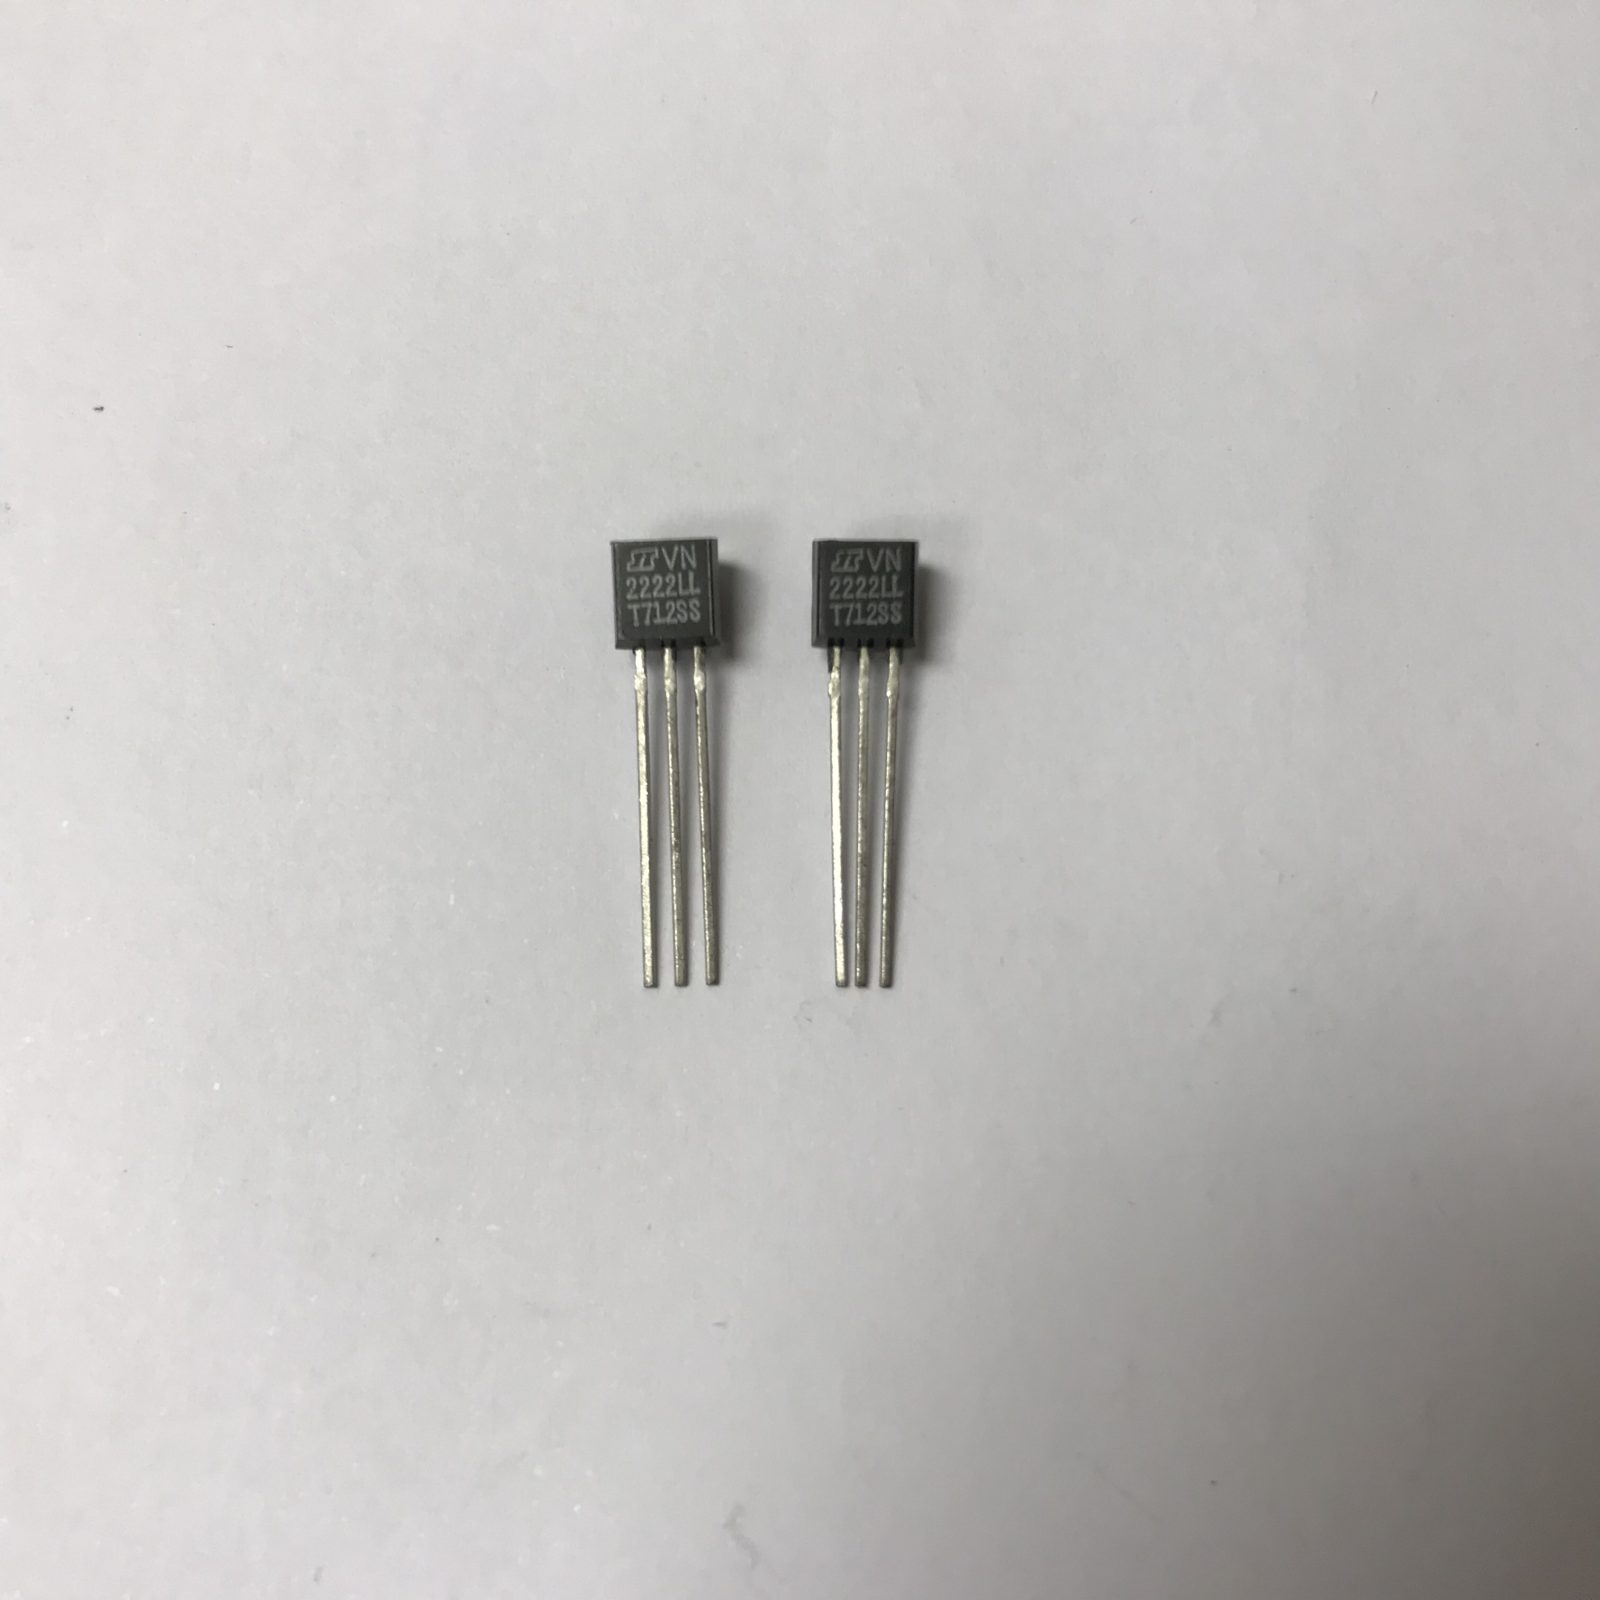 5.5V Rad doble VISHAY BC componentes MAL219612105E3 Cap 1F